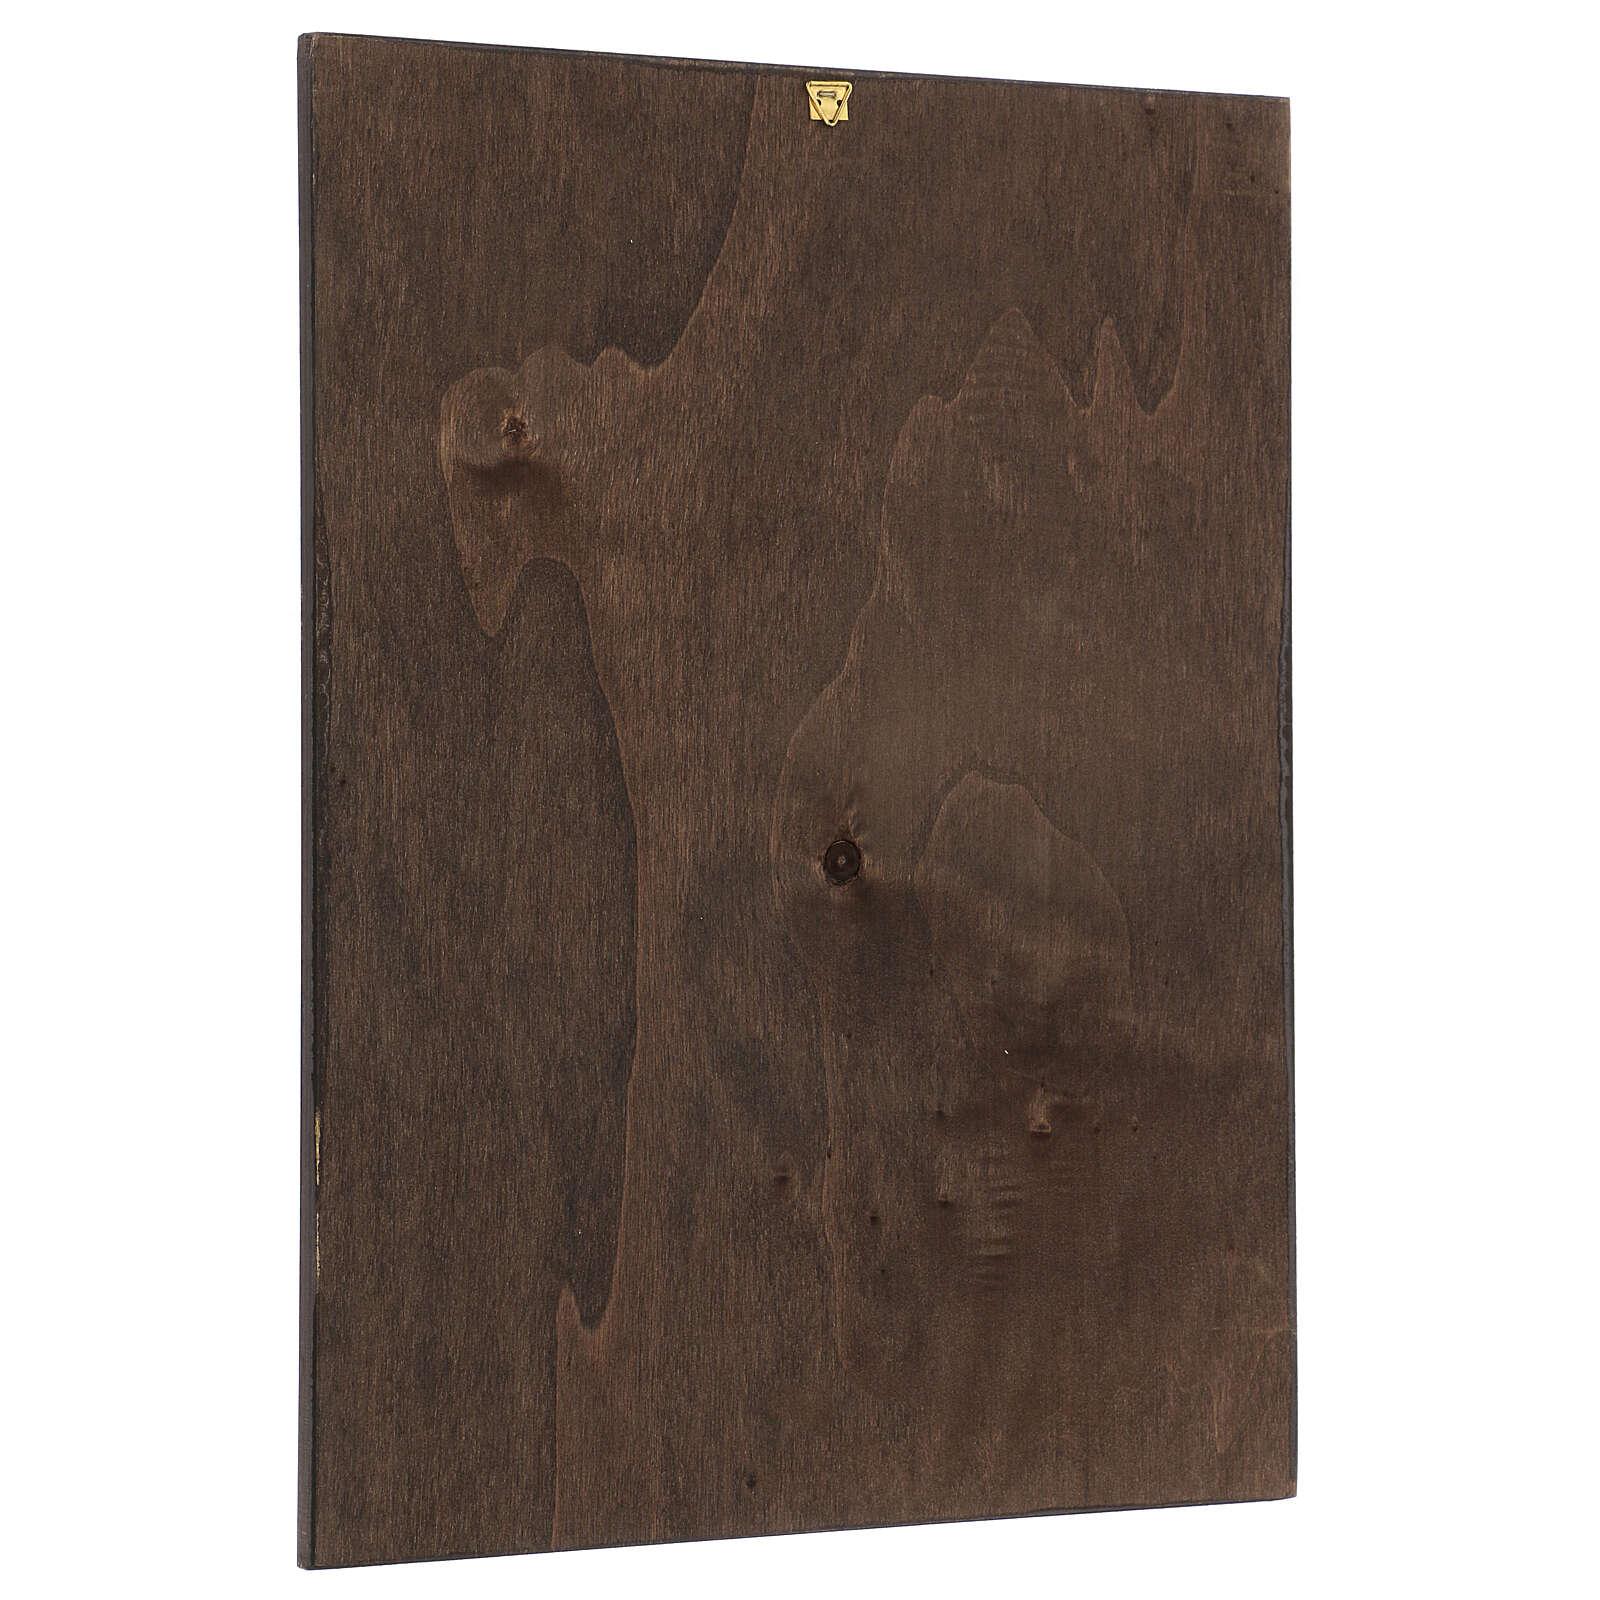 Cuadro impresa madera Virgen del Jilguero 35x25 cm 3